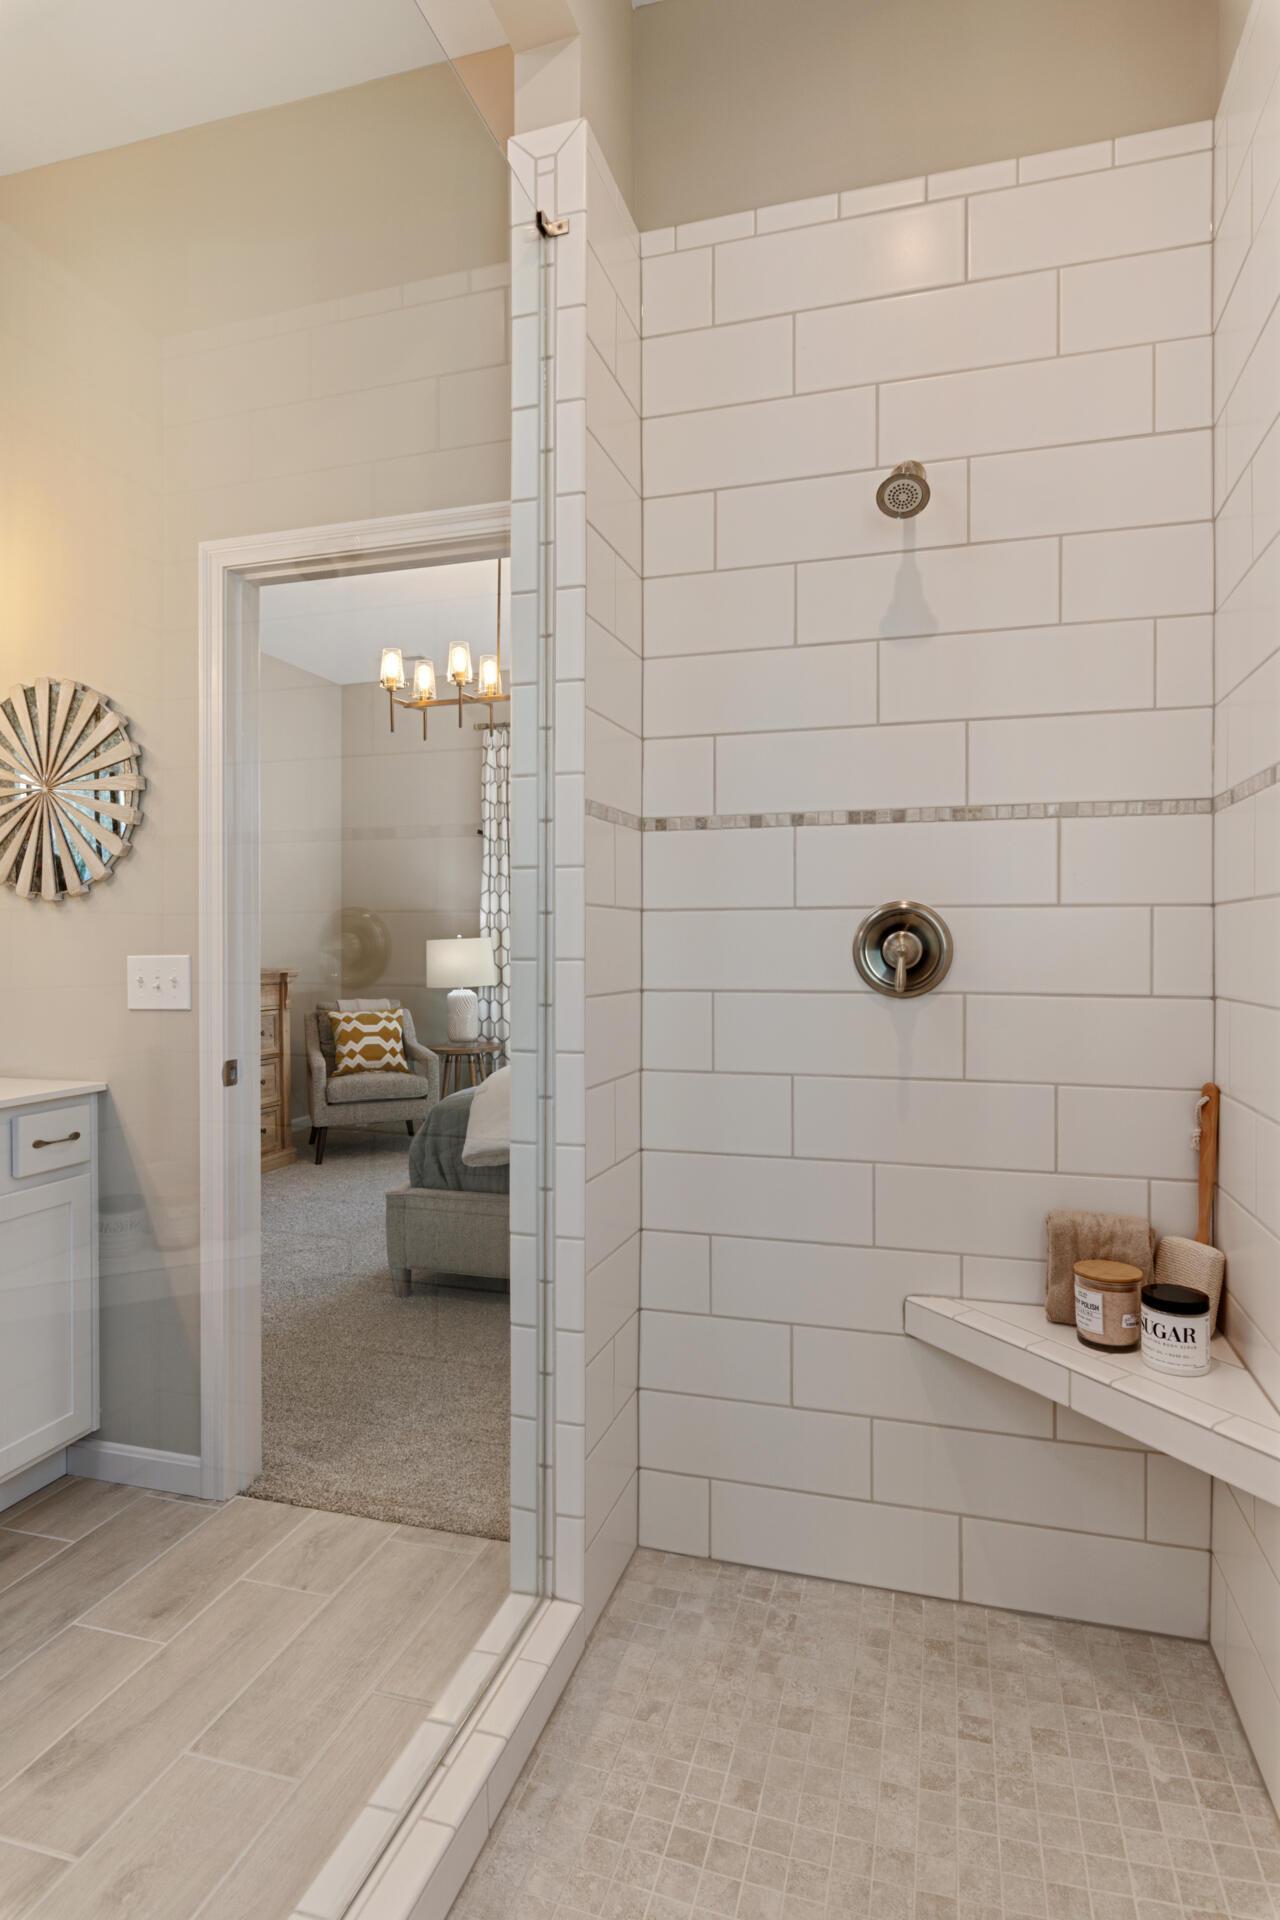 Bathroom featured in the Alwick By Drees Homes in Cincinnati, OH